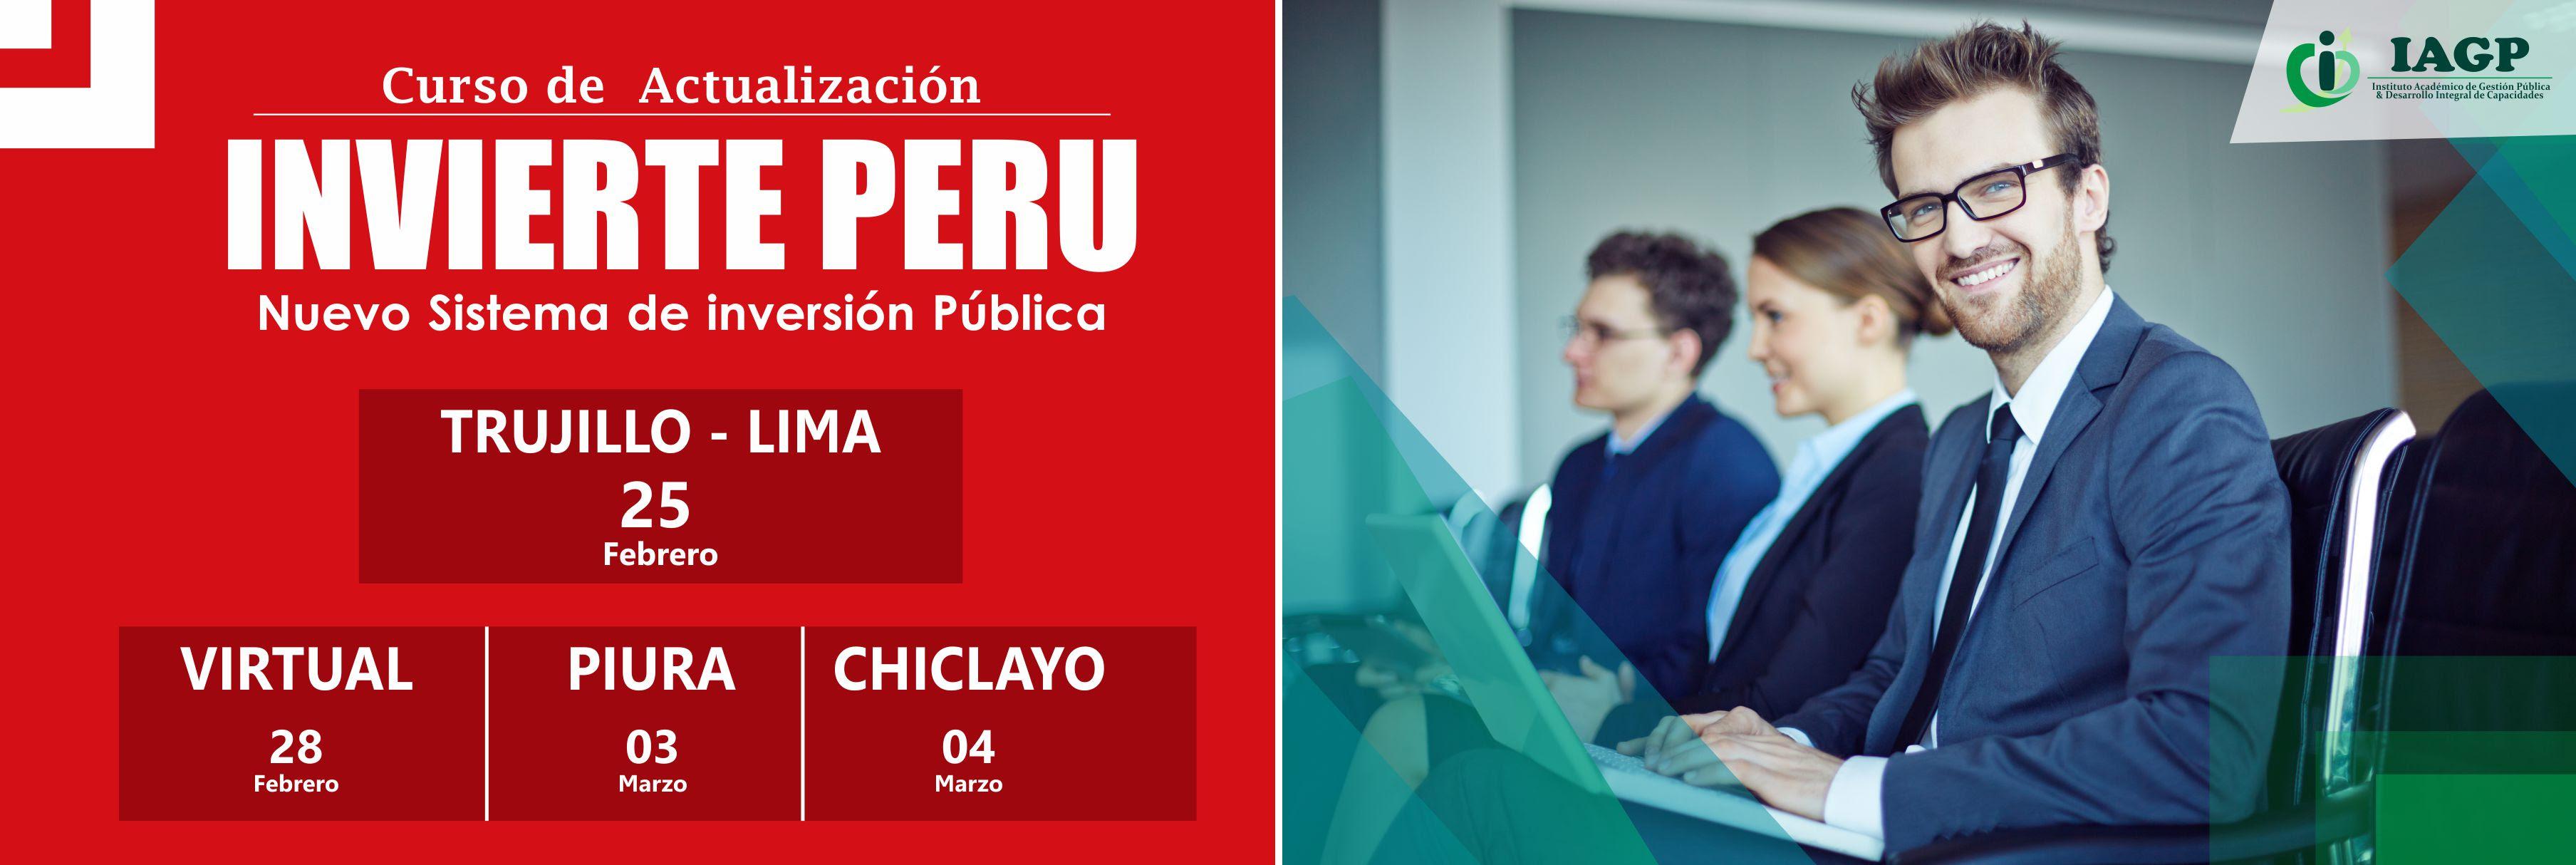 Curso Invierte Perú